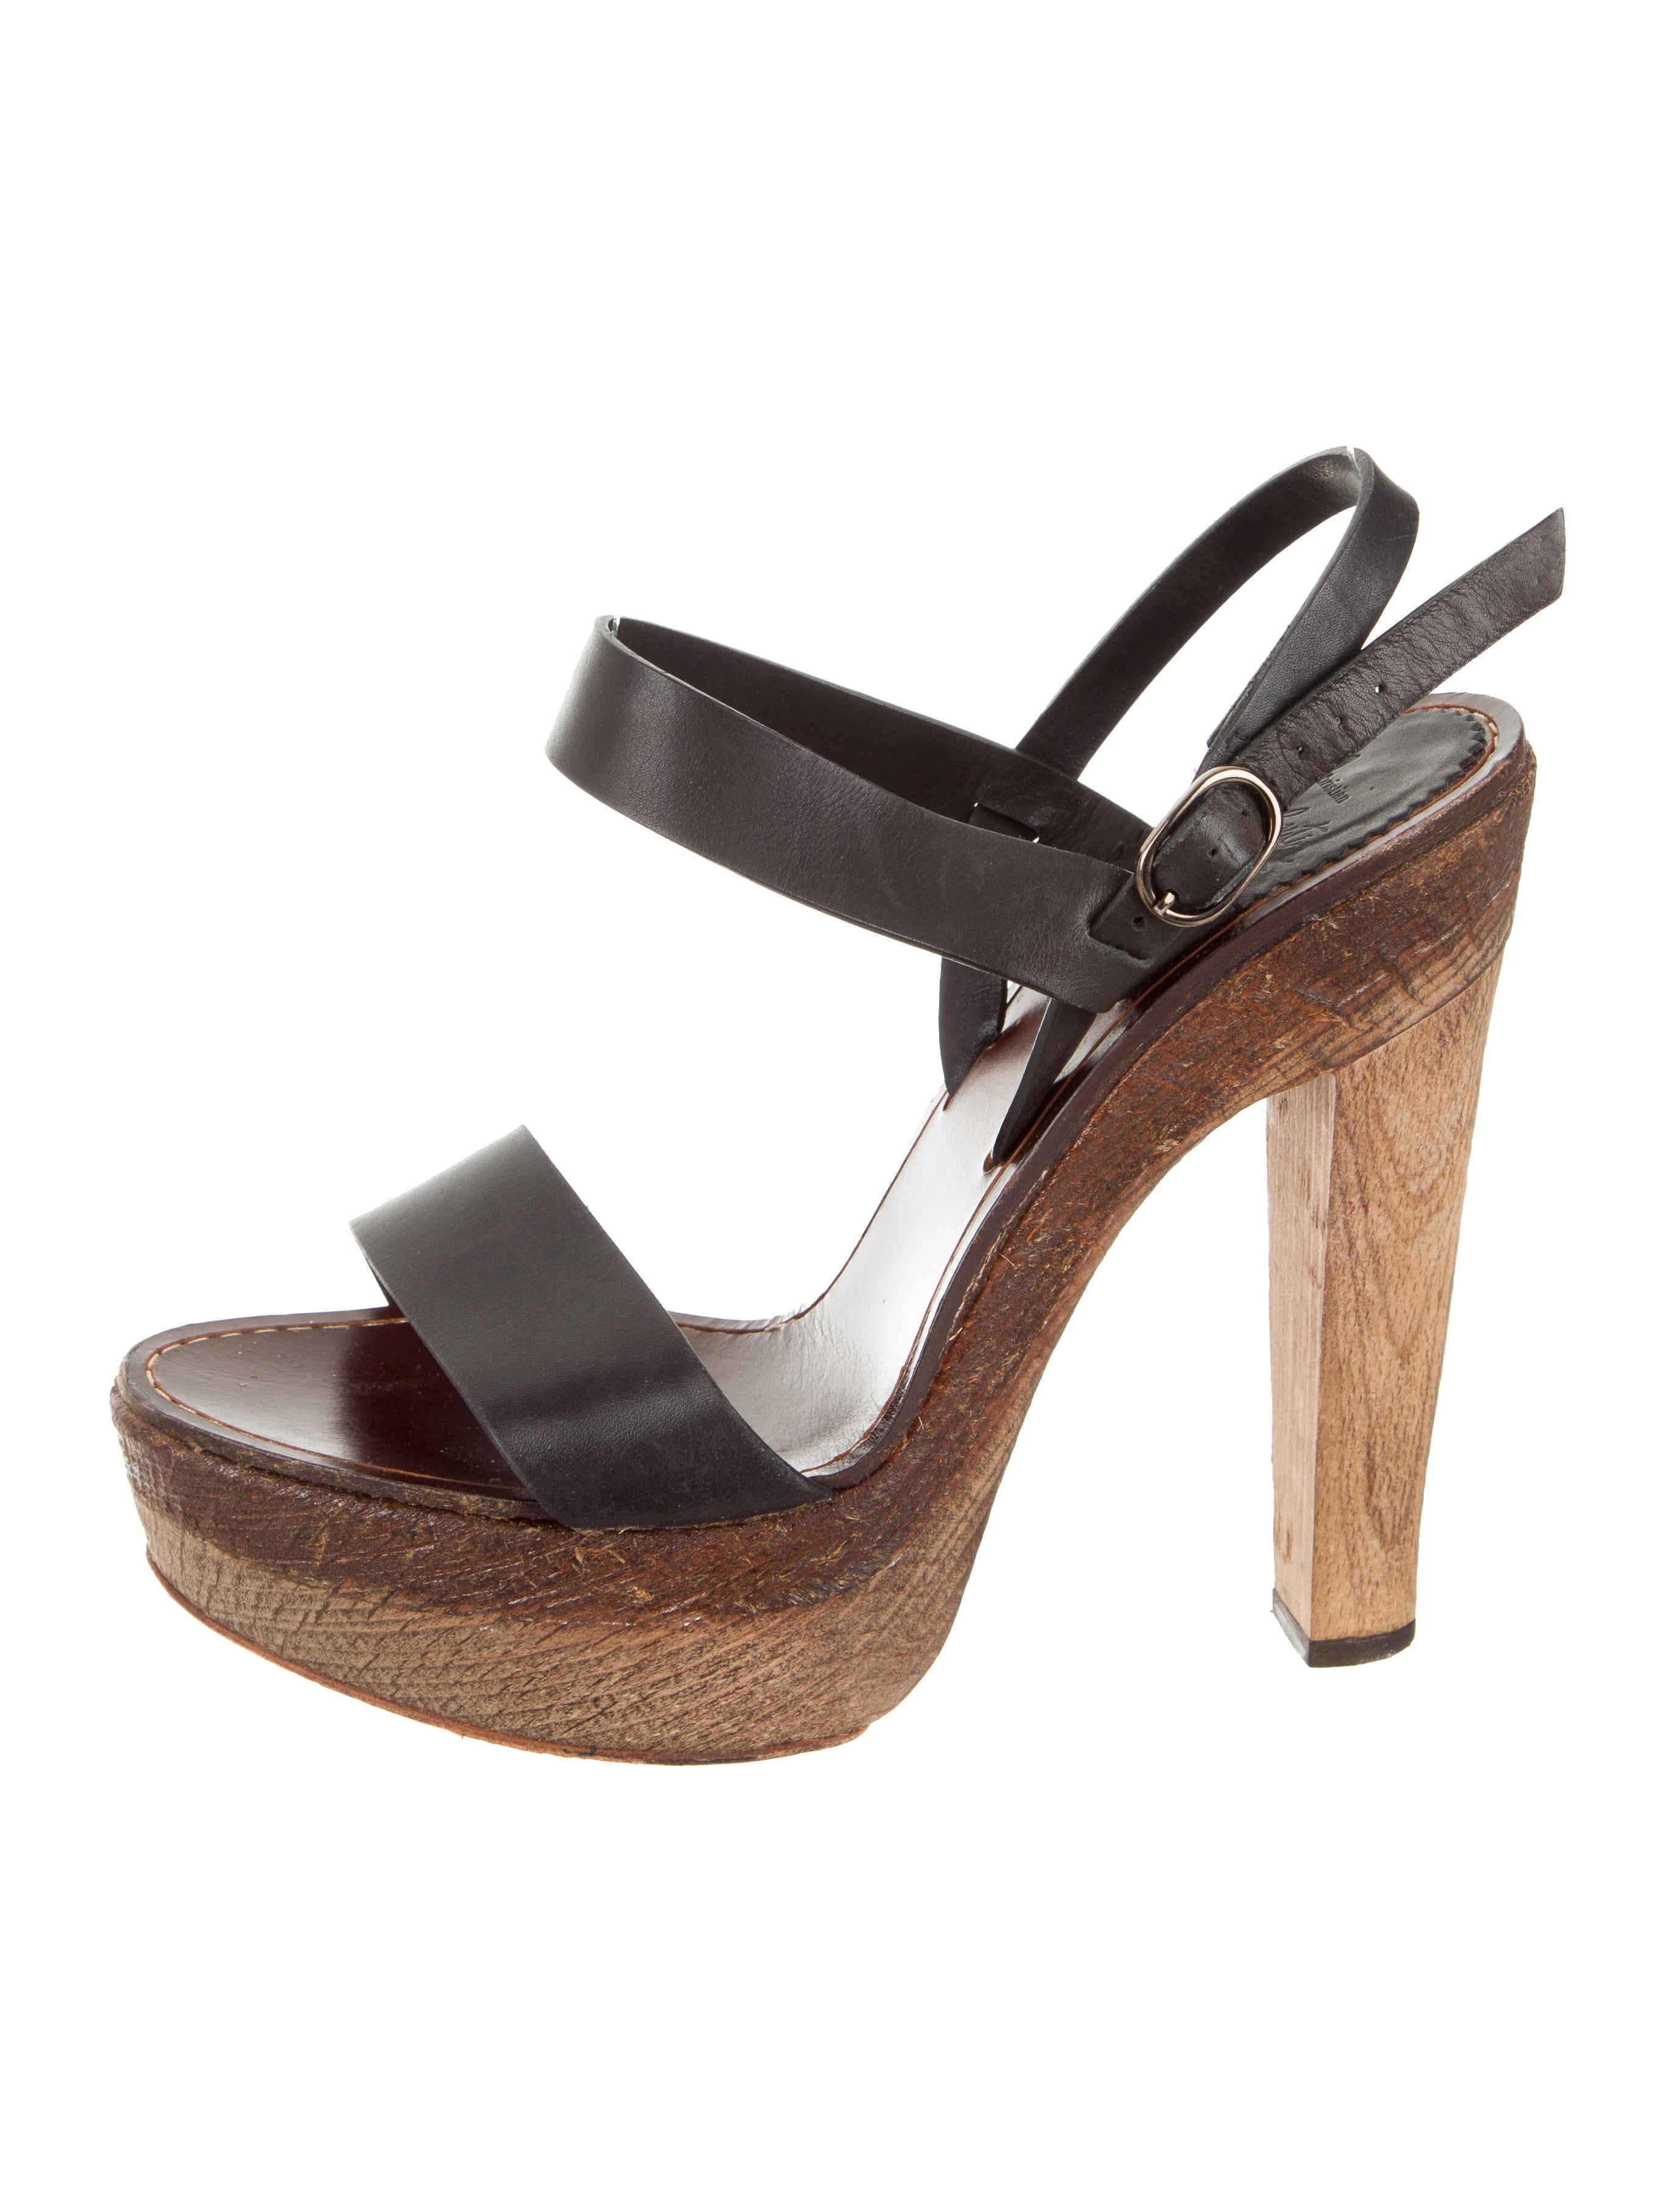 ece88151645 Christian Louboutin Platform Ankle Strap Sandals - Shoes - CHT125424 ...